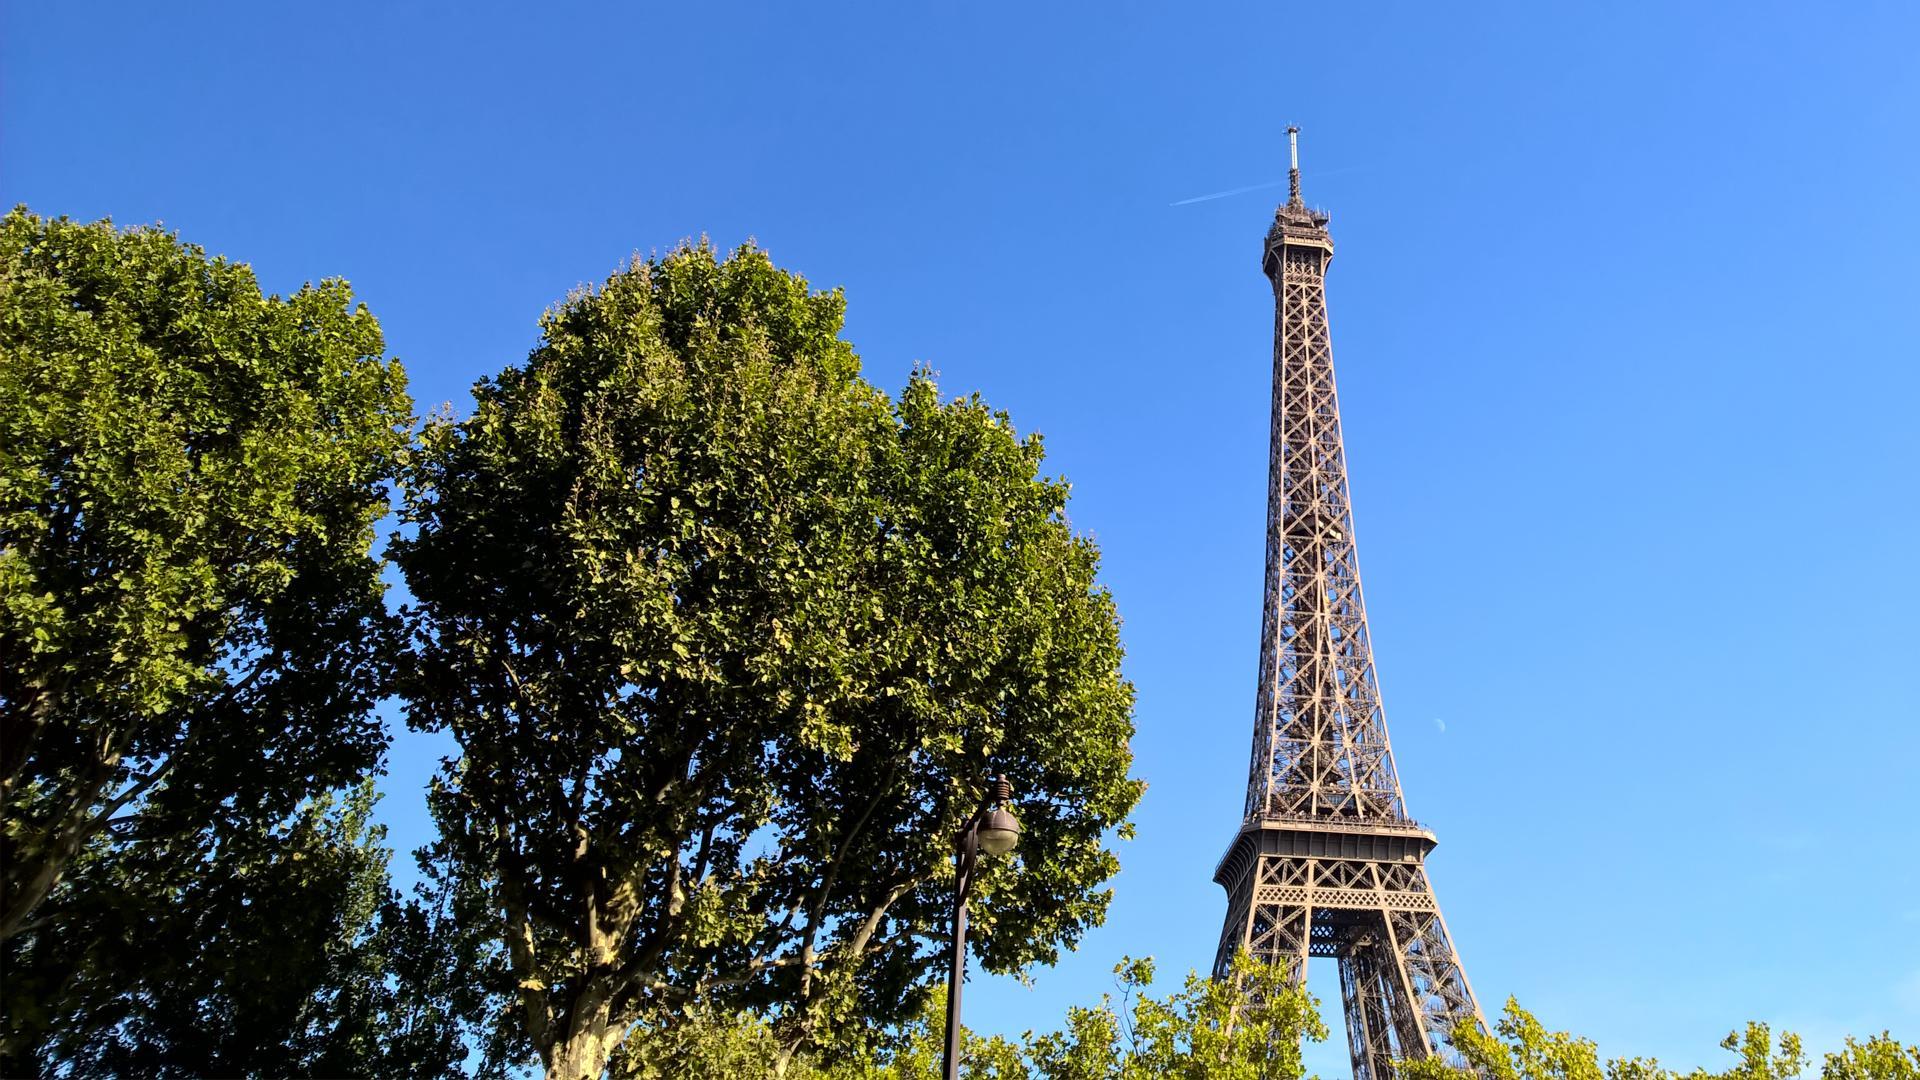 300 millones de euros para renovar la Torre Eiffel